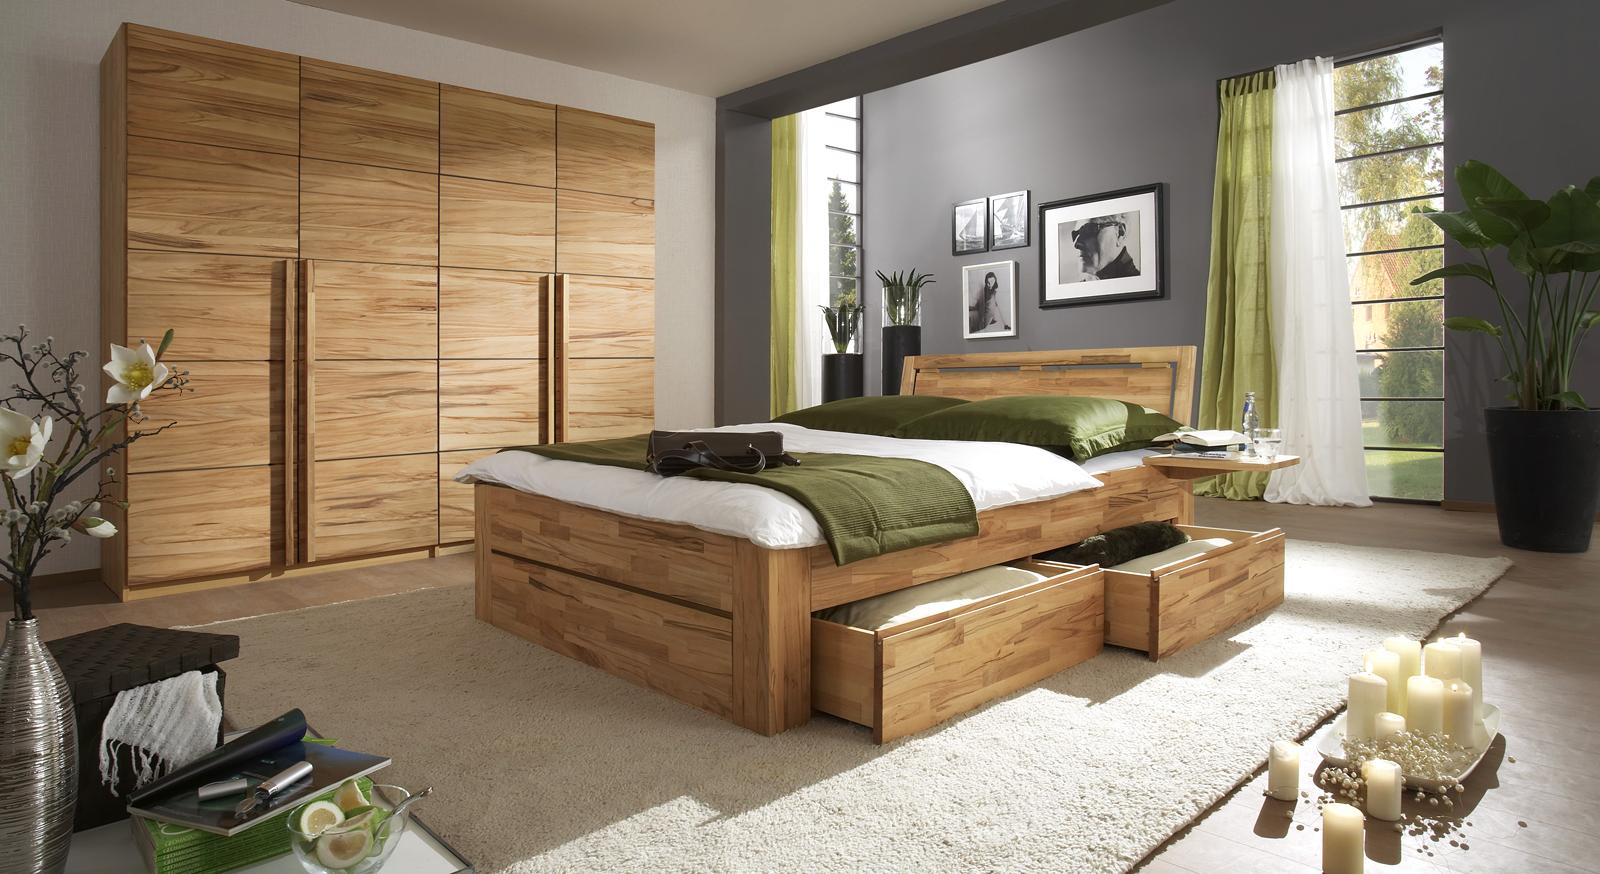 Komplett schlafzimmer aus massivholz andalucia - Schlafzimmer massivholz modern ...